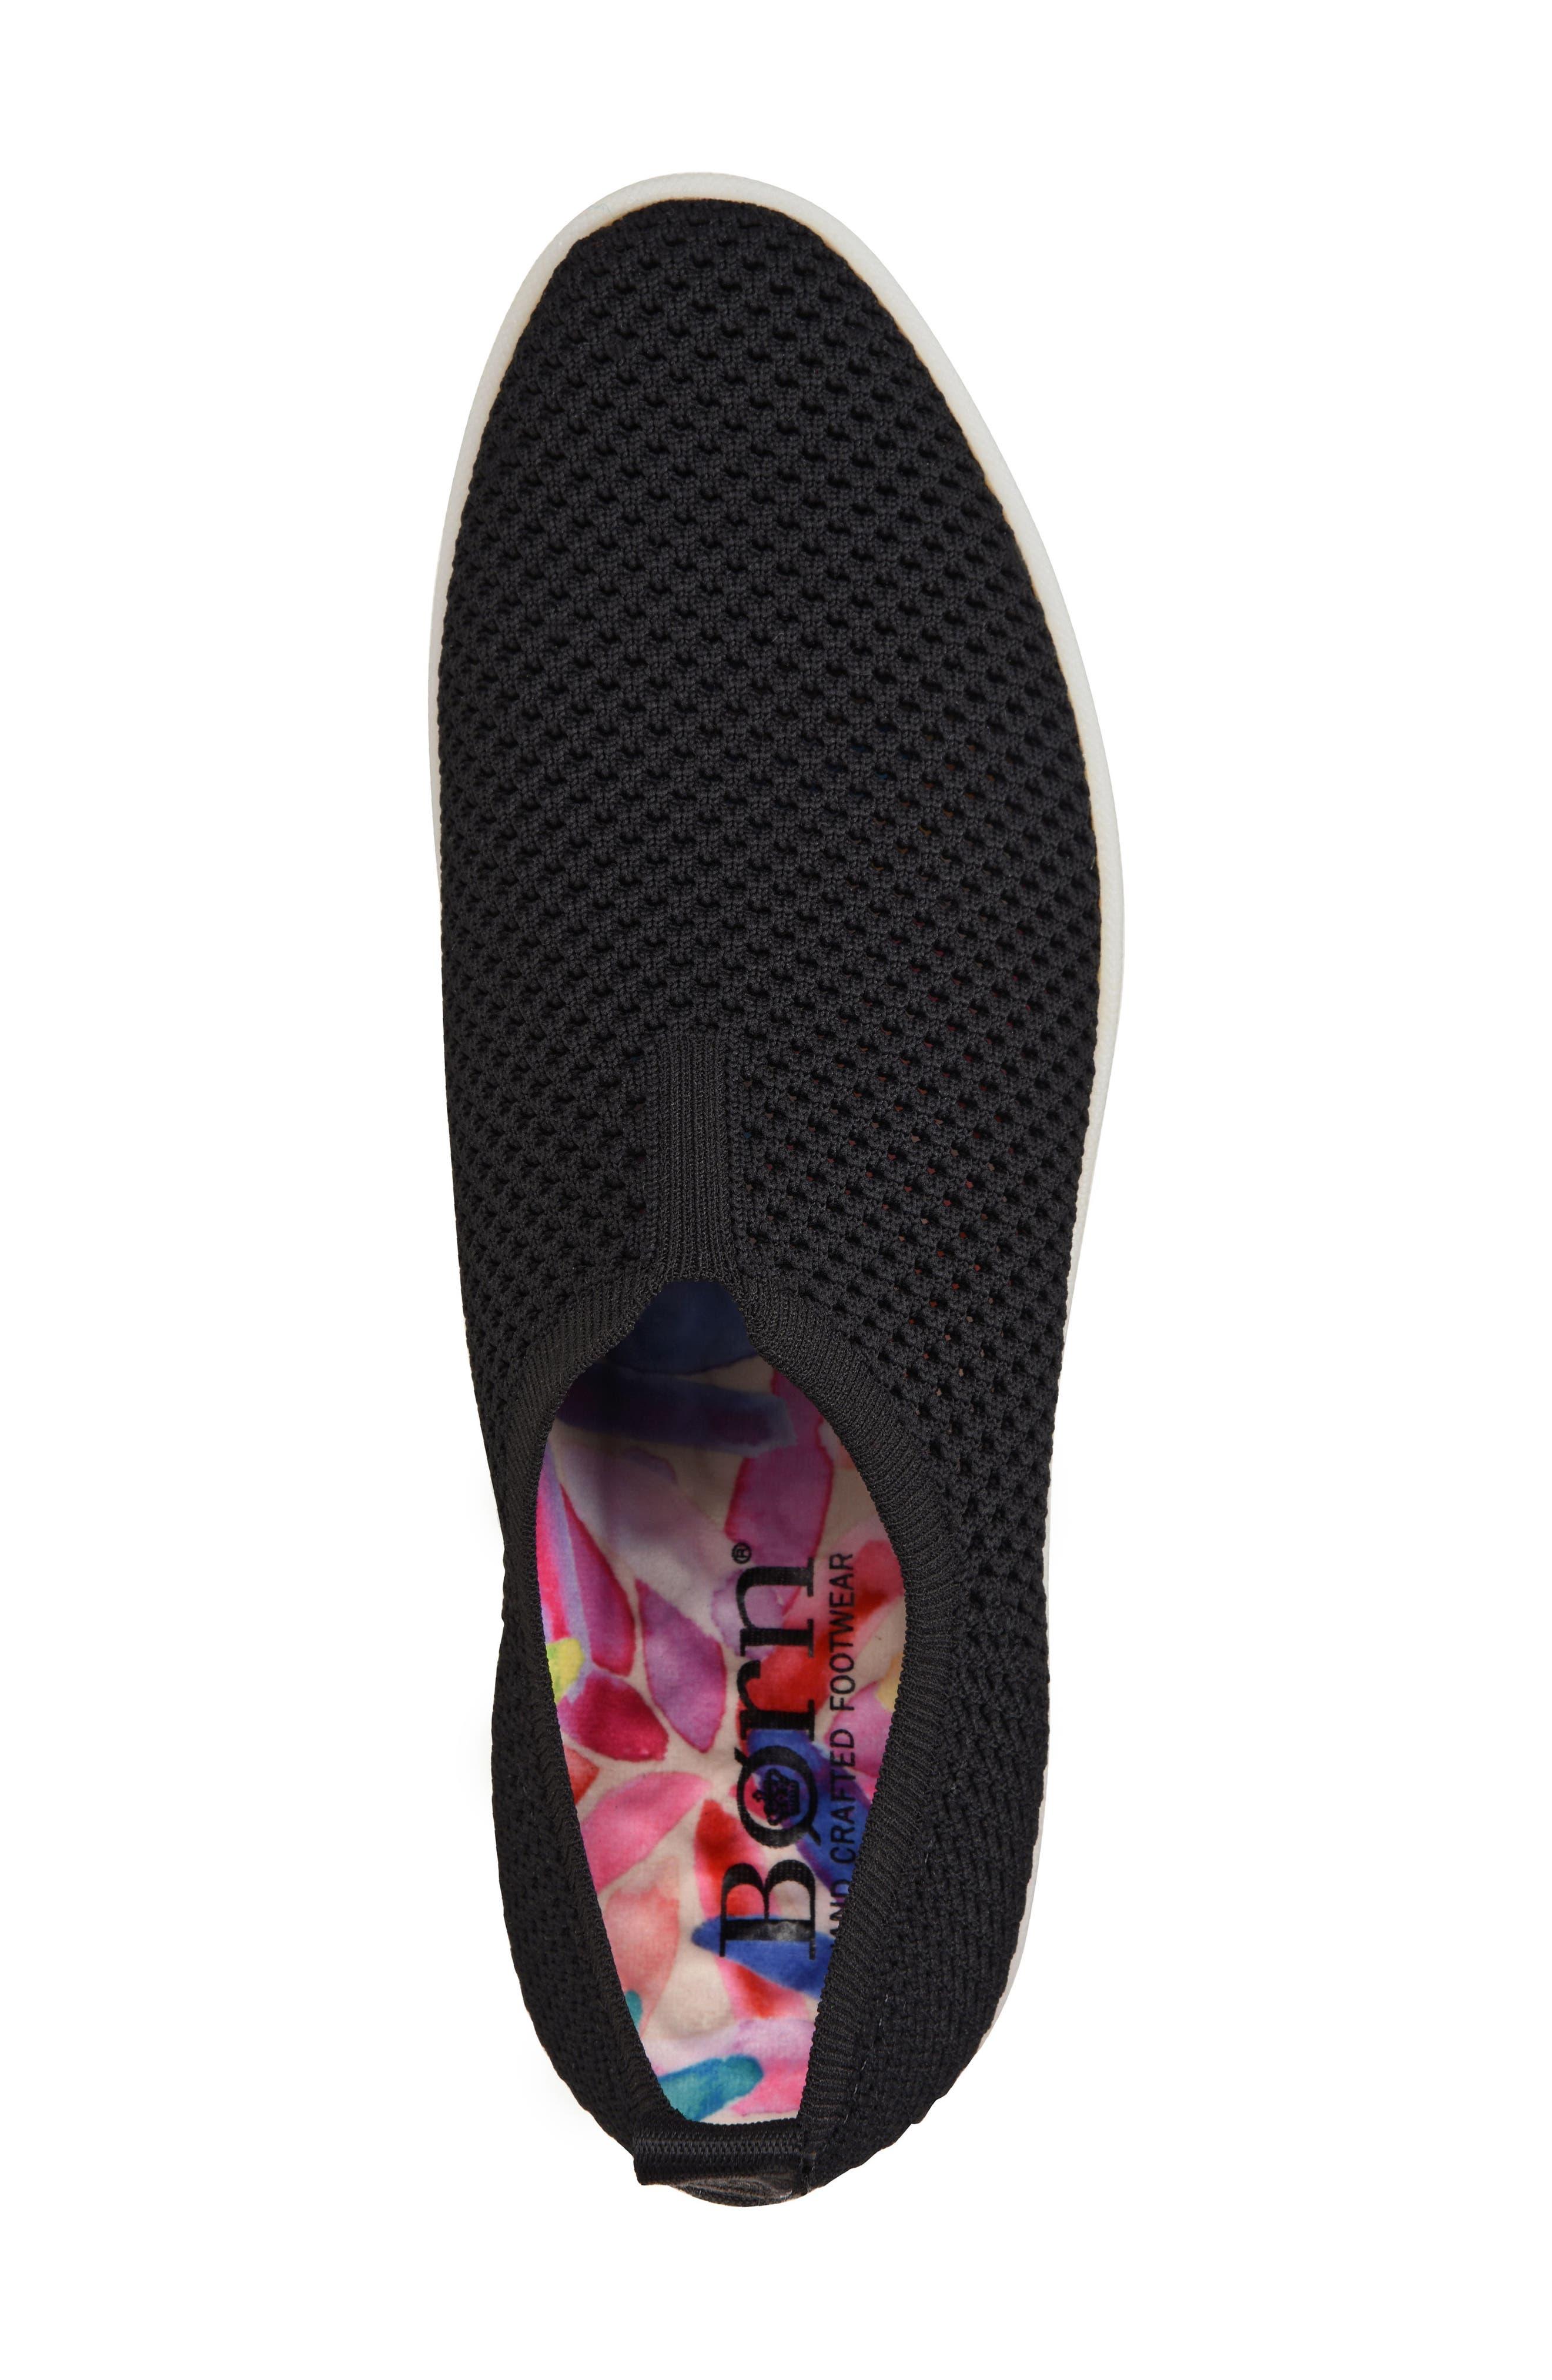 Hazy Slip-On Sneaker,                             Alternate thumbnail 5, color,                             Black Fabric